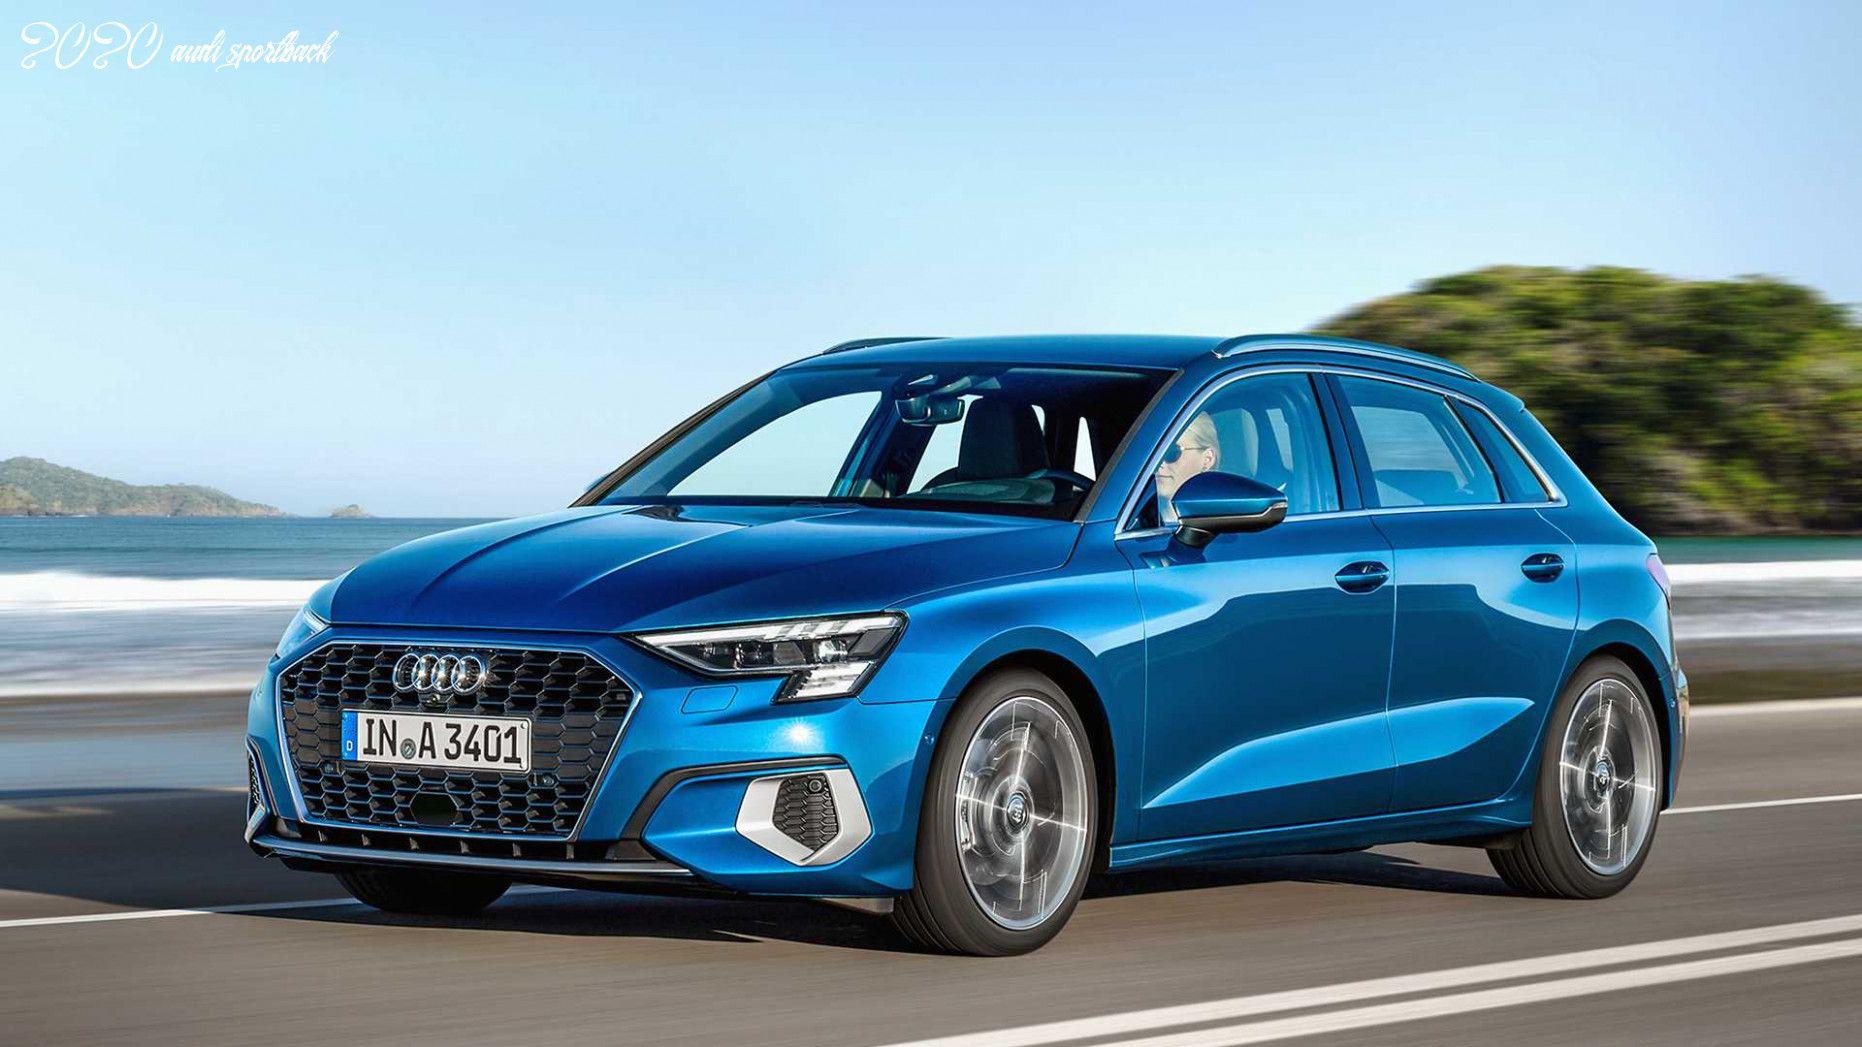 2020 Audi Sportback in 2020 Audi a3 sportback, Audi